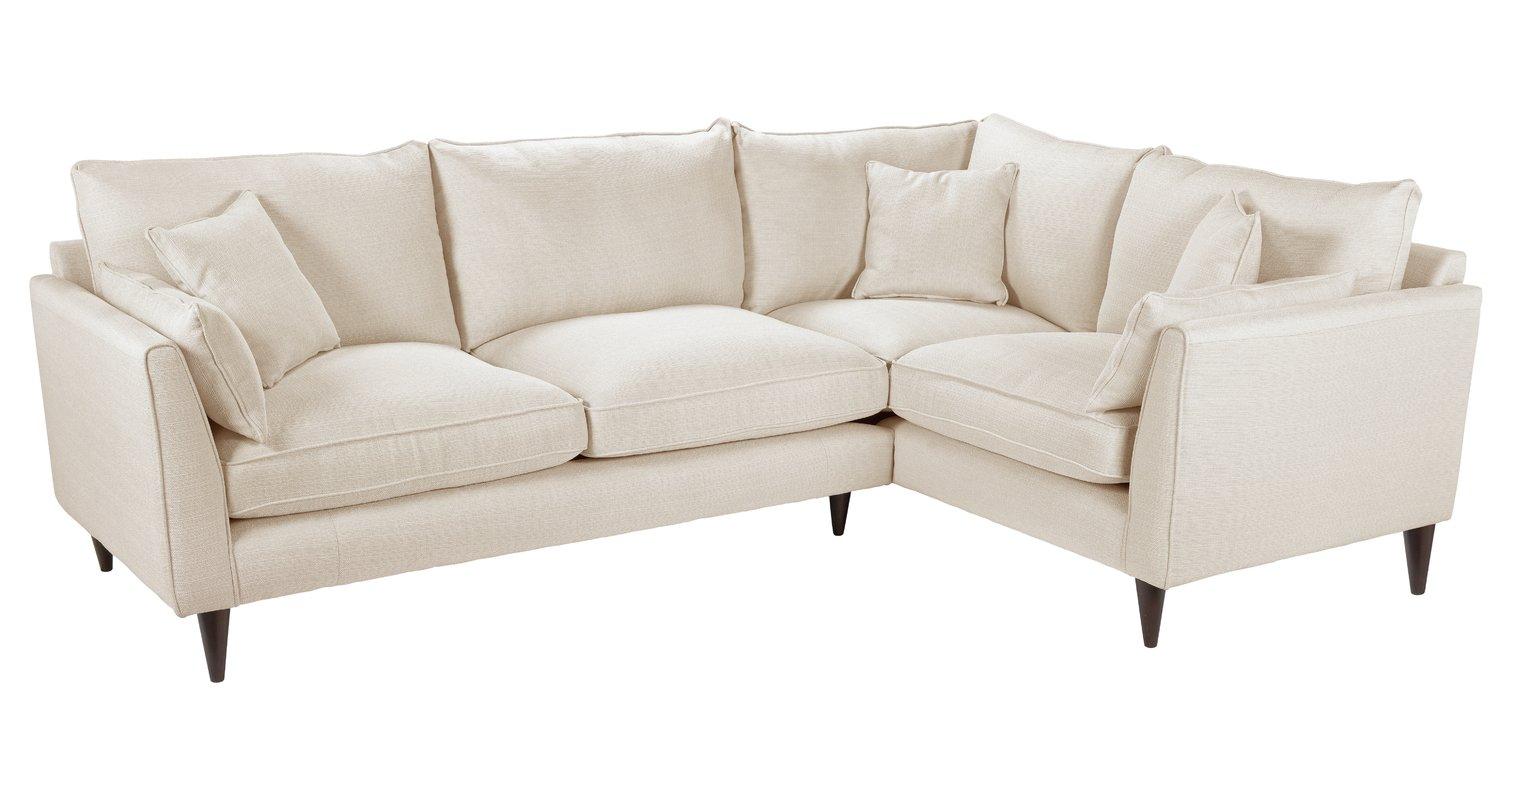 Argos Home Hector Right Corner Fabric Sofa review